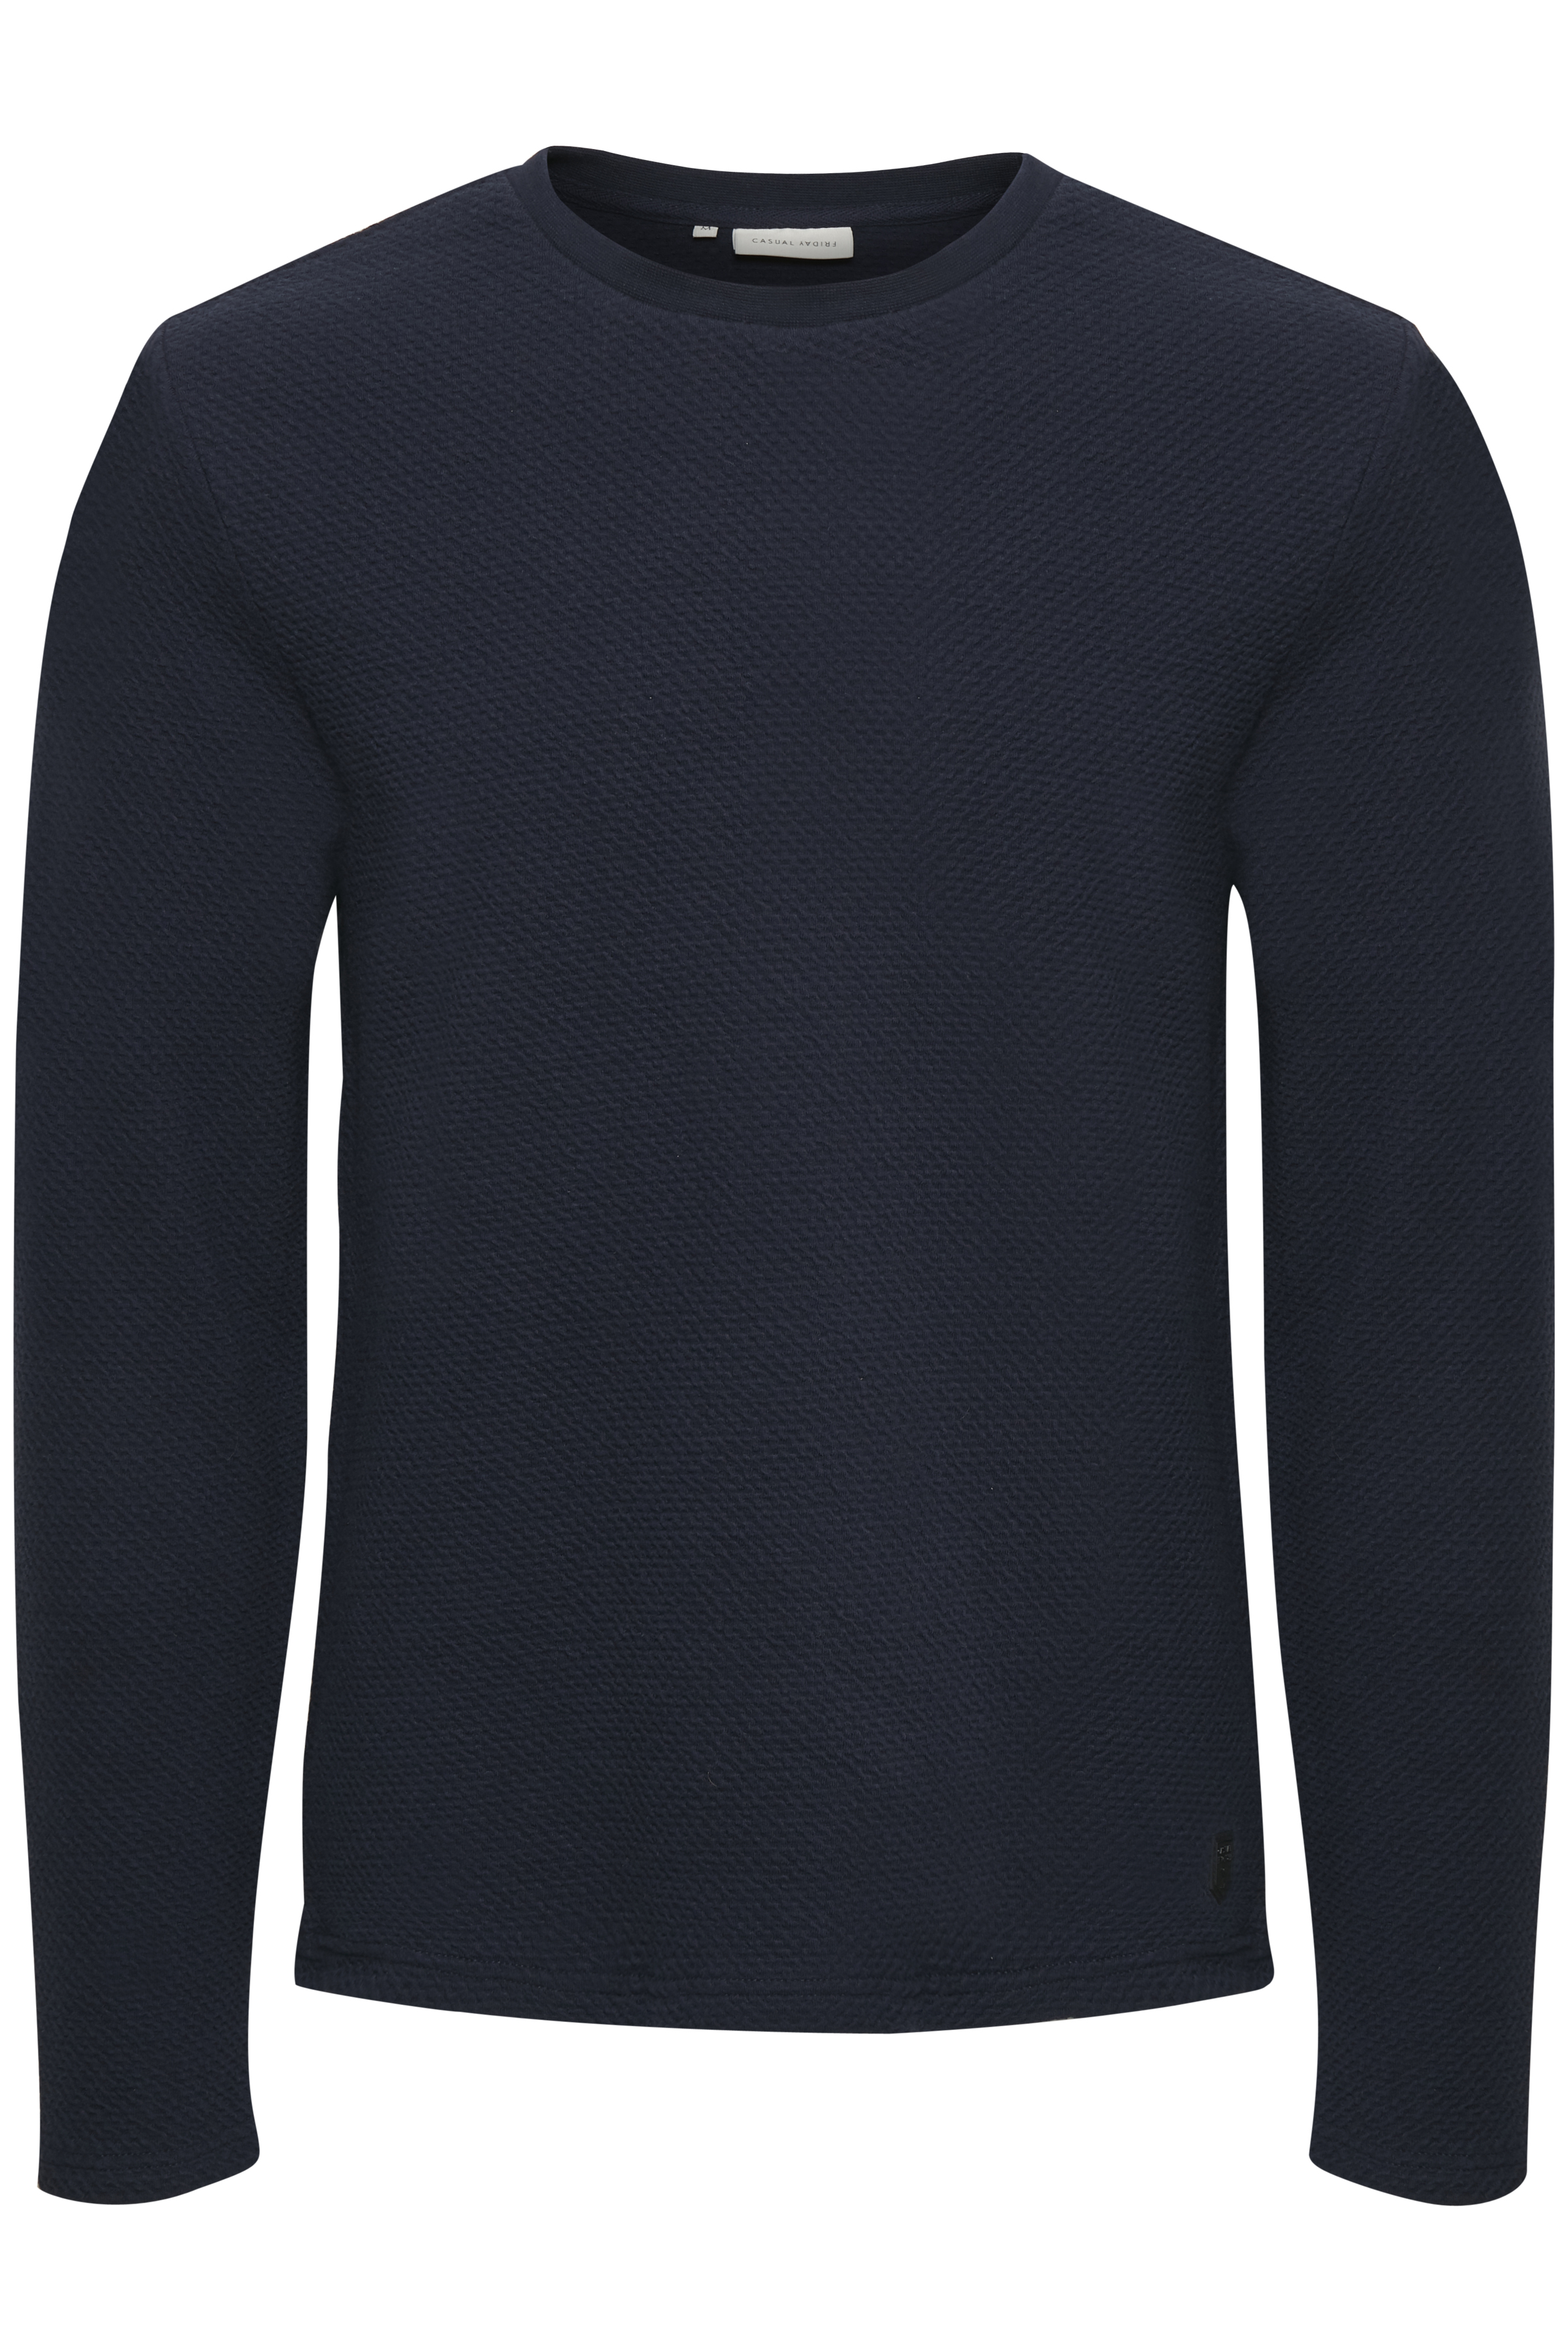 Casual Friday Herre Sweatshirt - Mørk marineblå